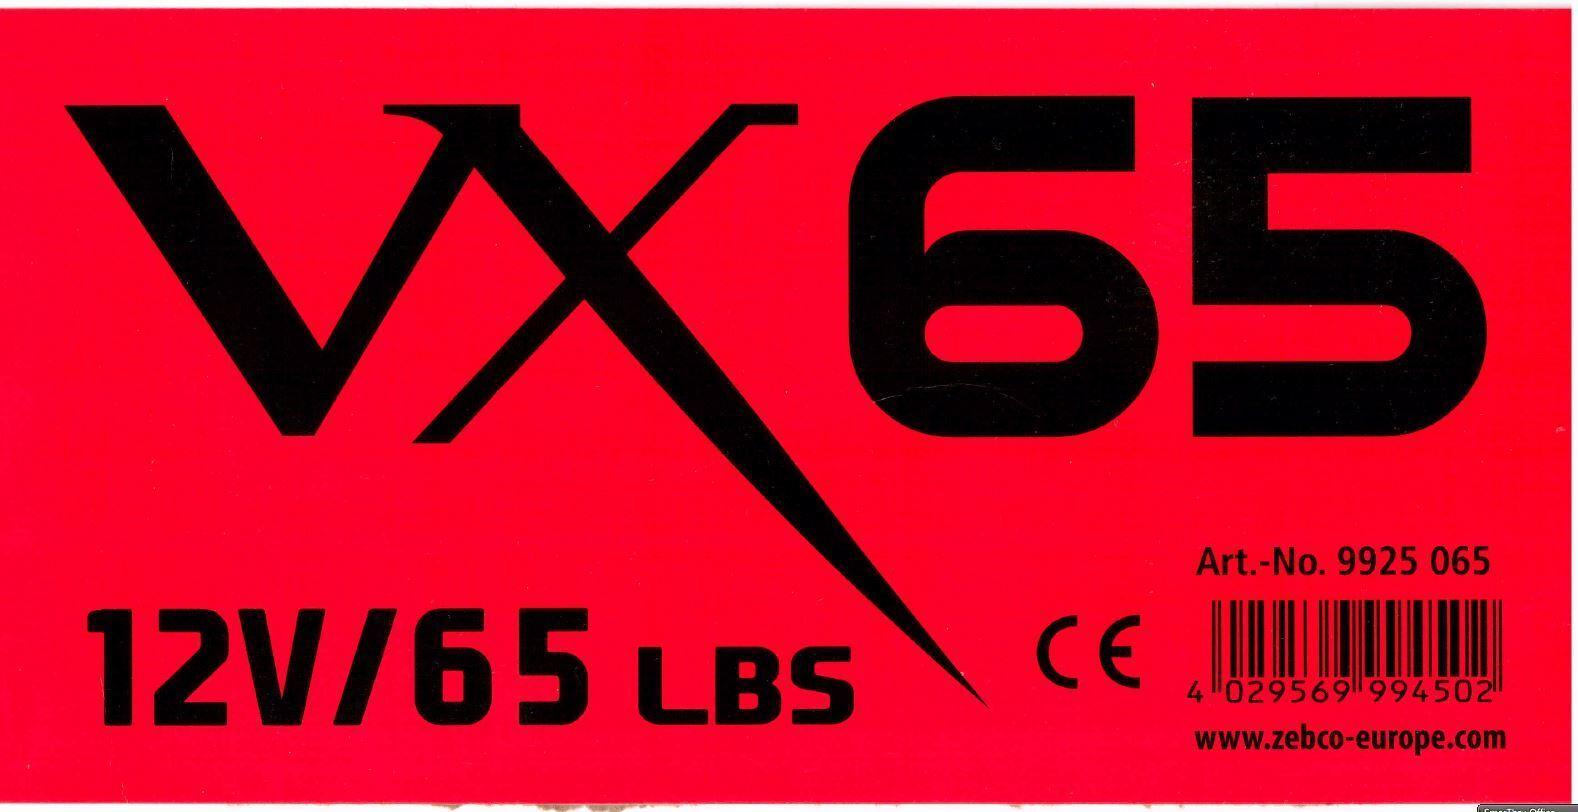 ZEBCO RHINO R - VX NEUES 65 SUPERSPORT ELEKTROStiefelMOTOR 12VOLT NEUES VX MODELL 2017 8c356f